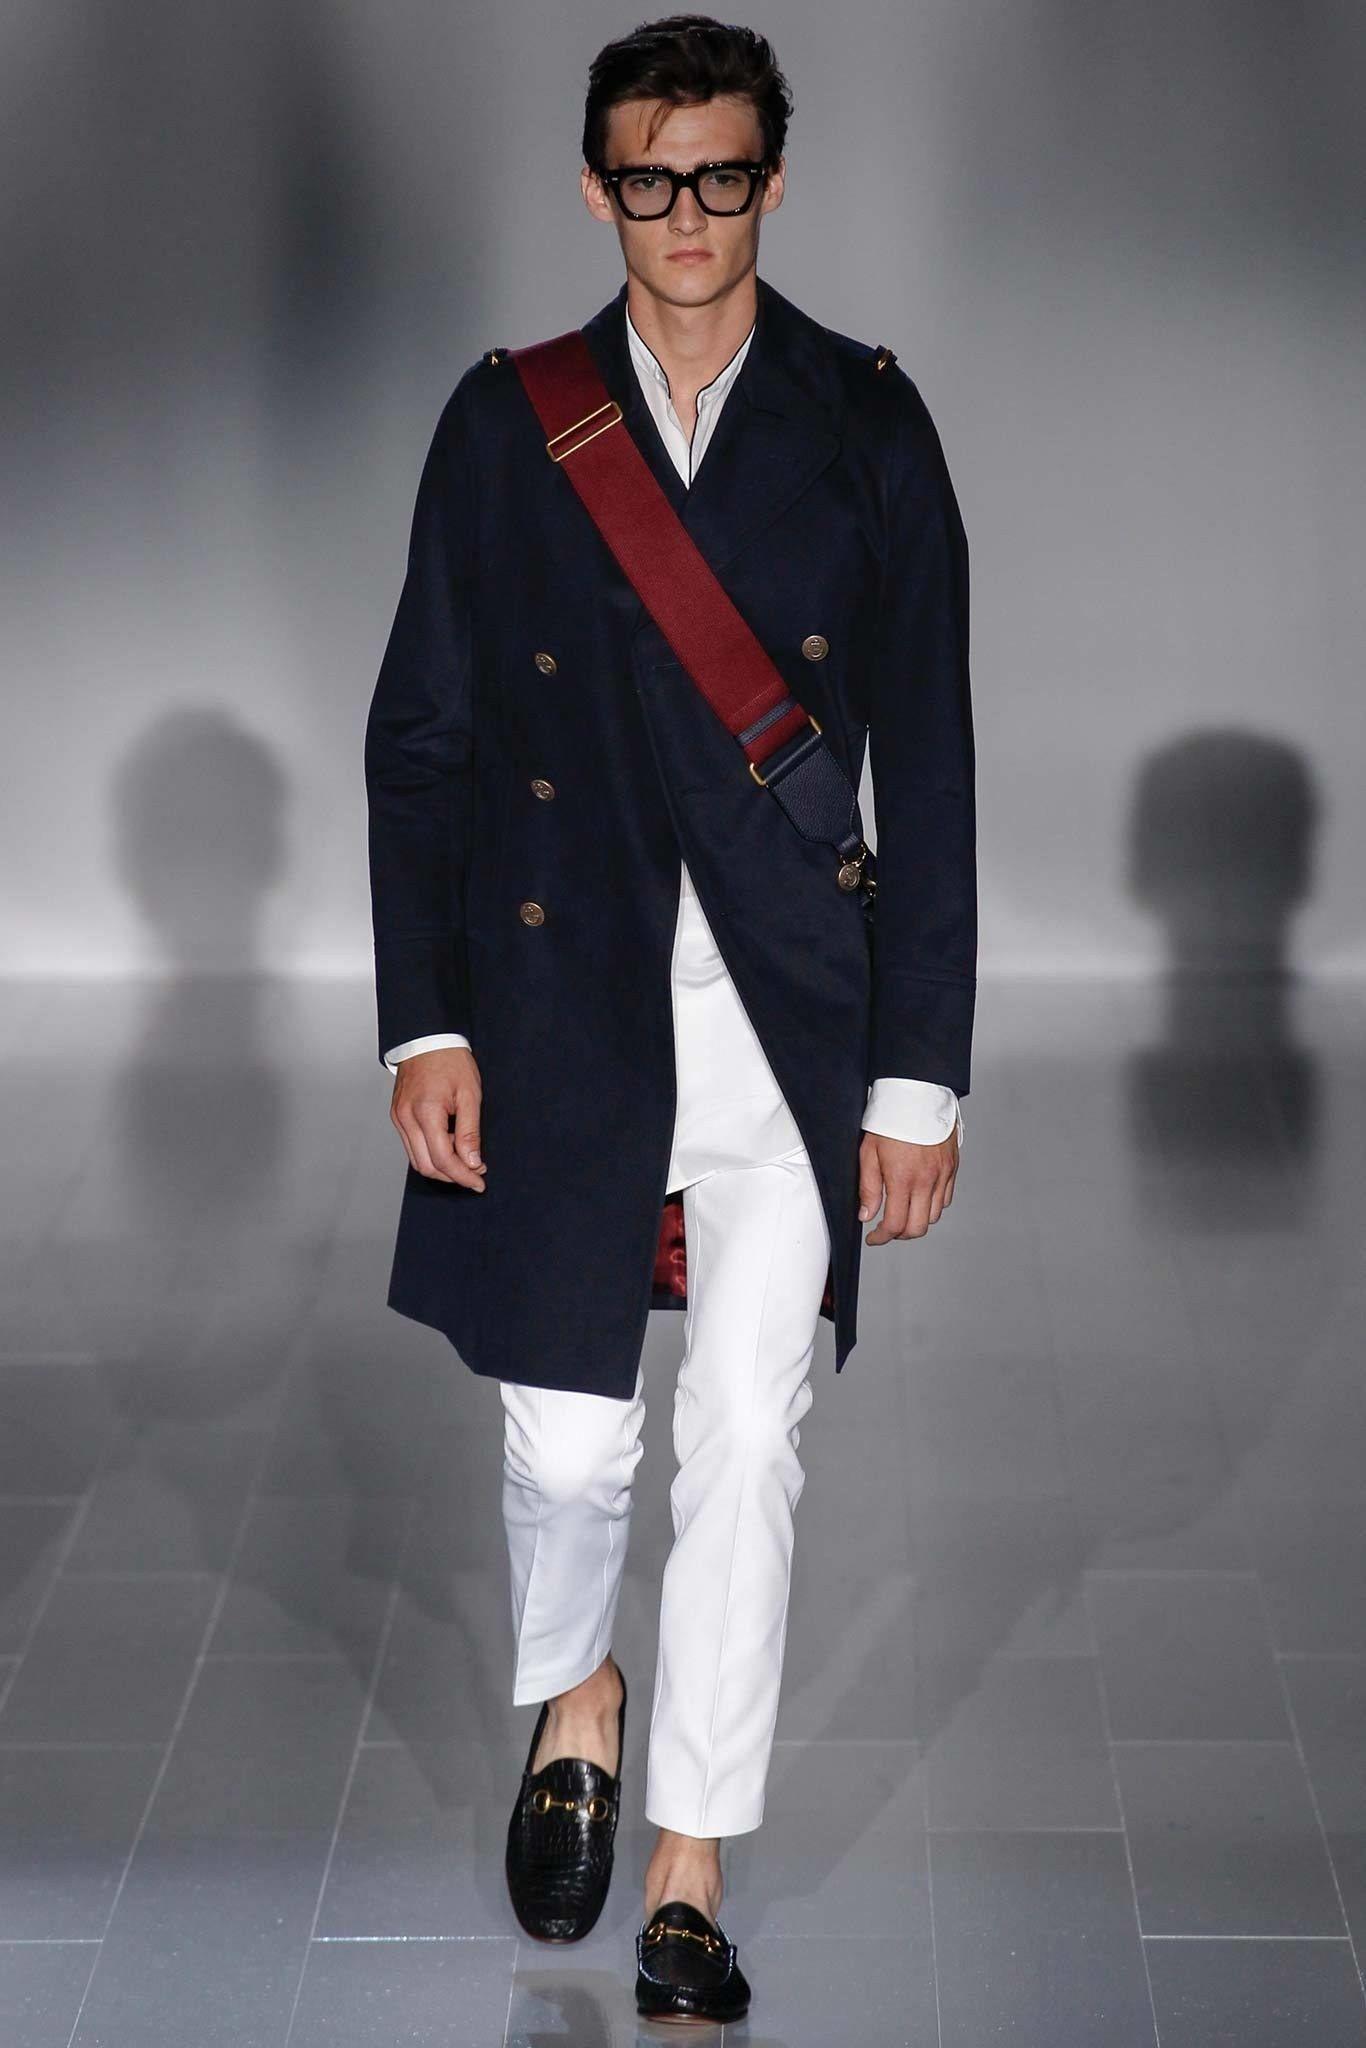 Gucci Spring 2015 Menswear Fashion Show Vêtements homme